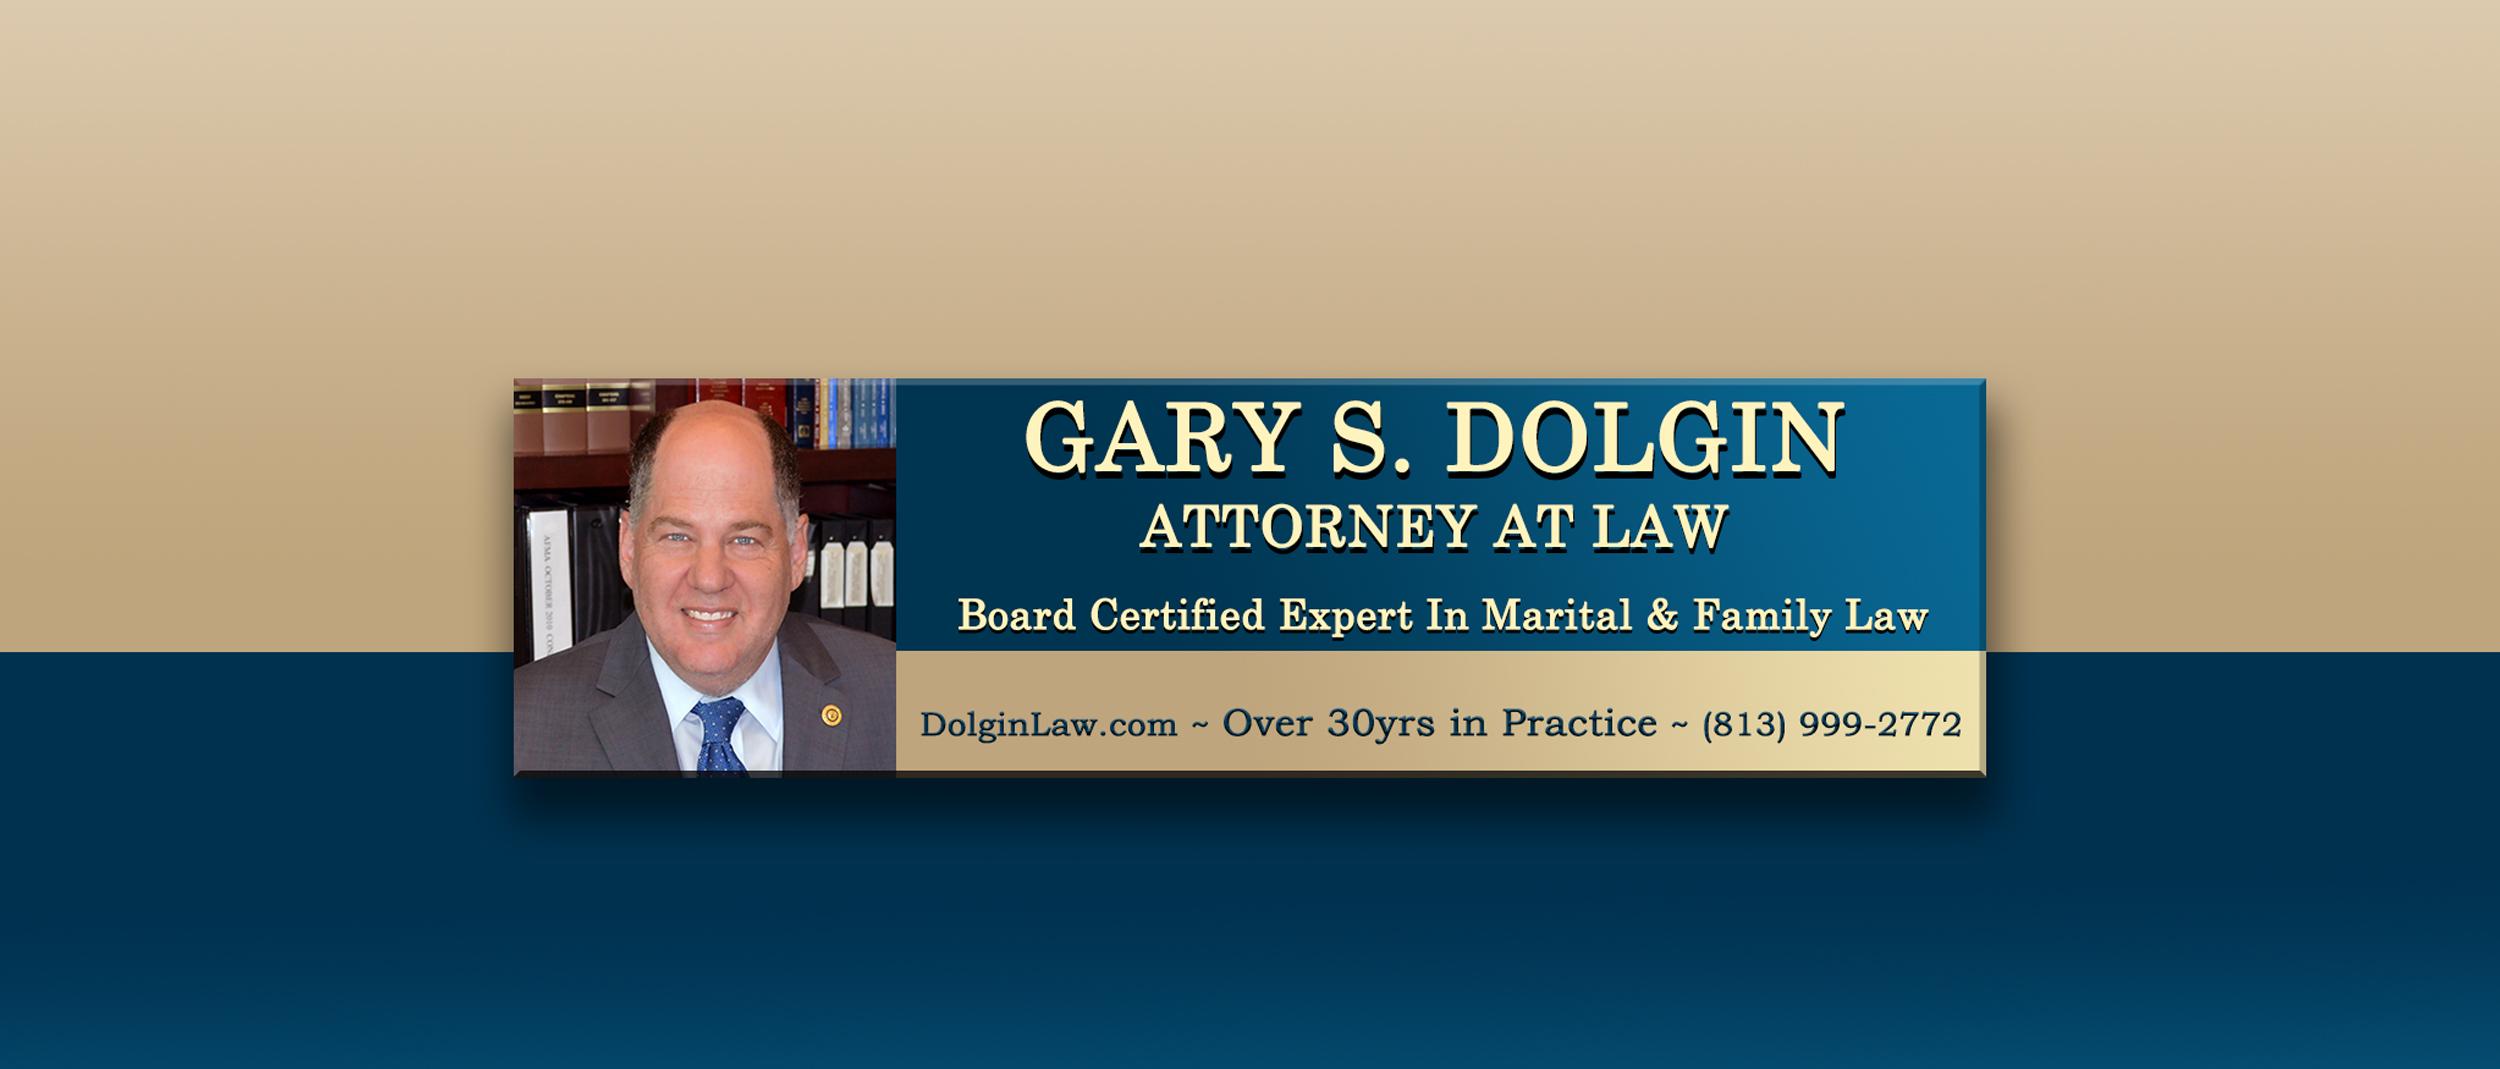 Best Divorce Attorney in Tampa Gary S Dolgin